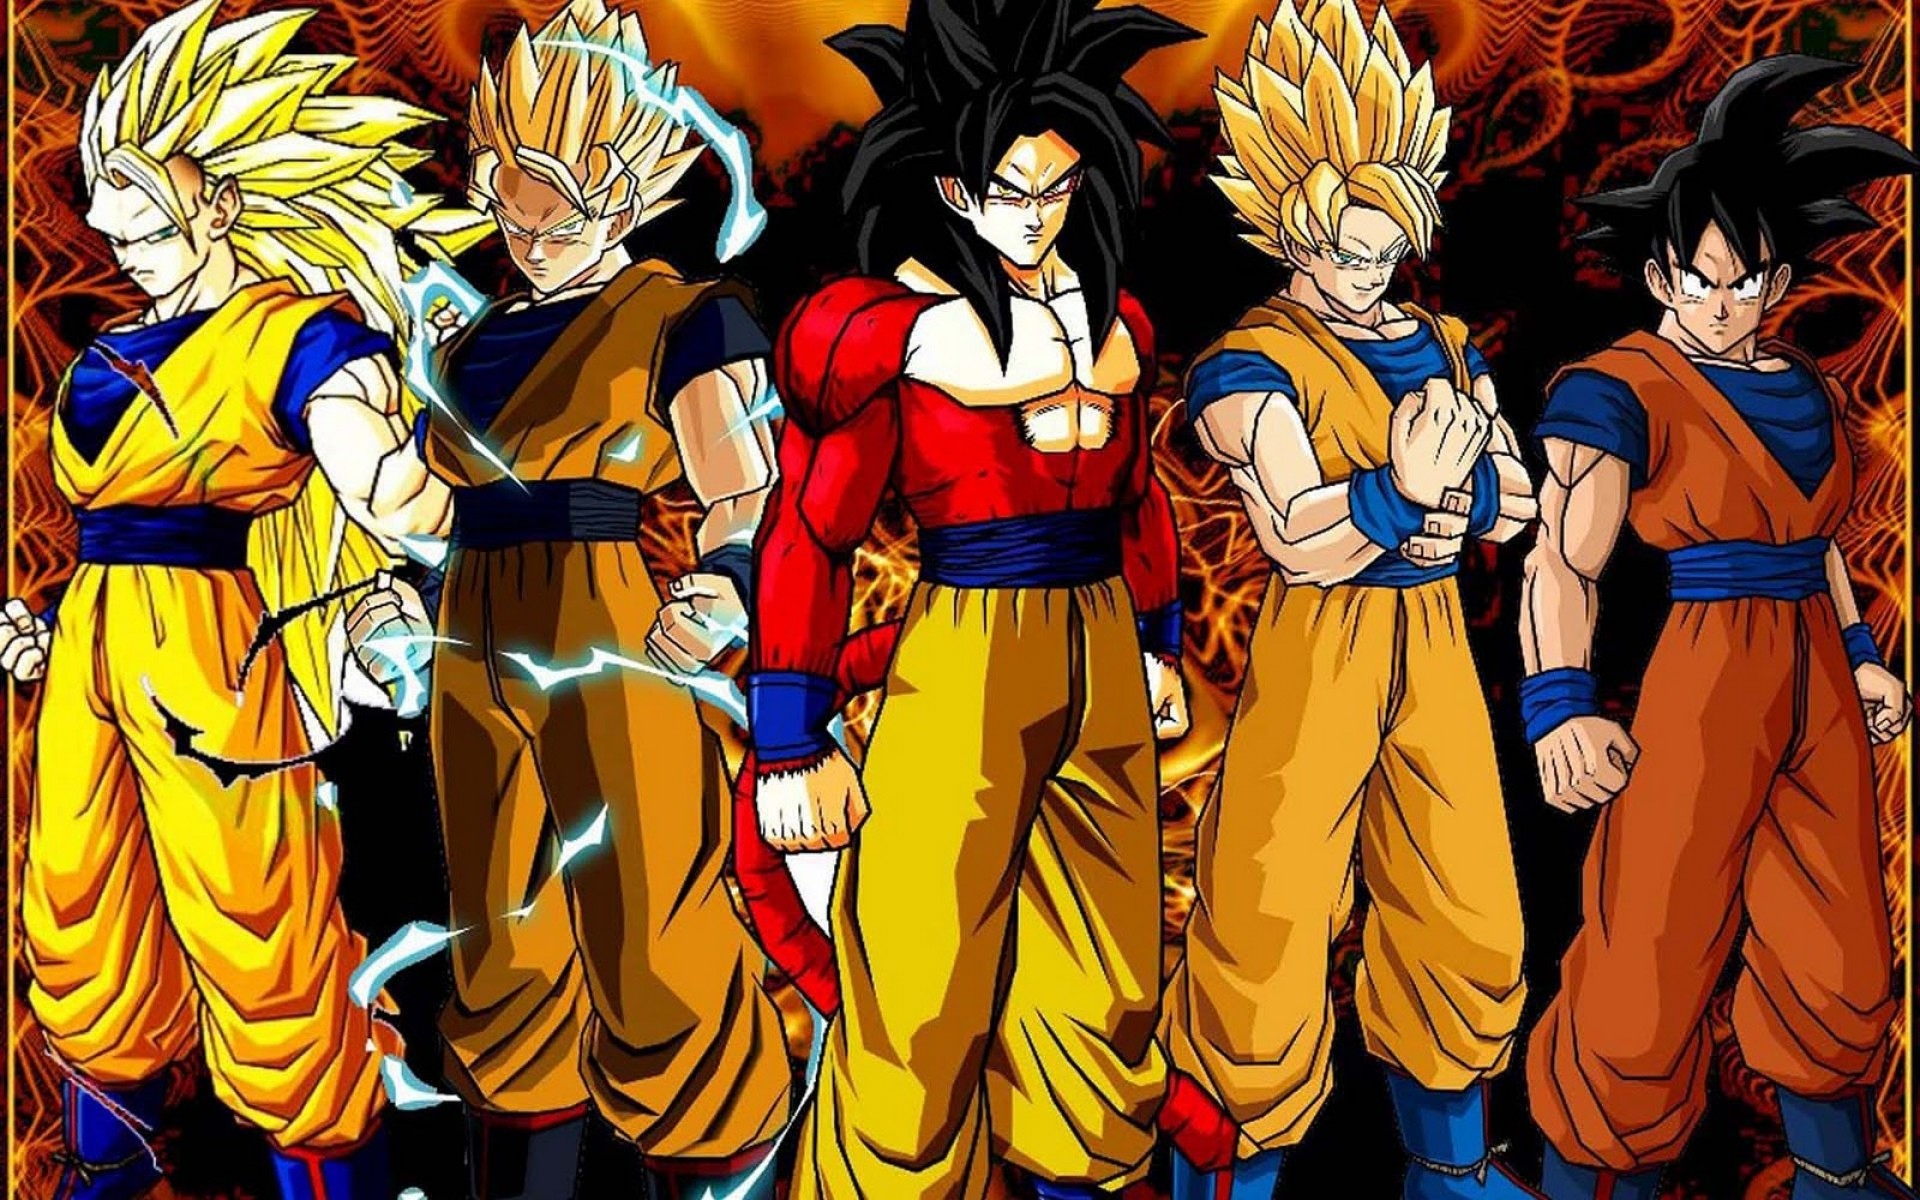 Dragon Ball Z Son Goku All Super Saiyan Form Wallpaper